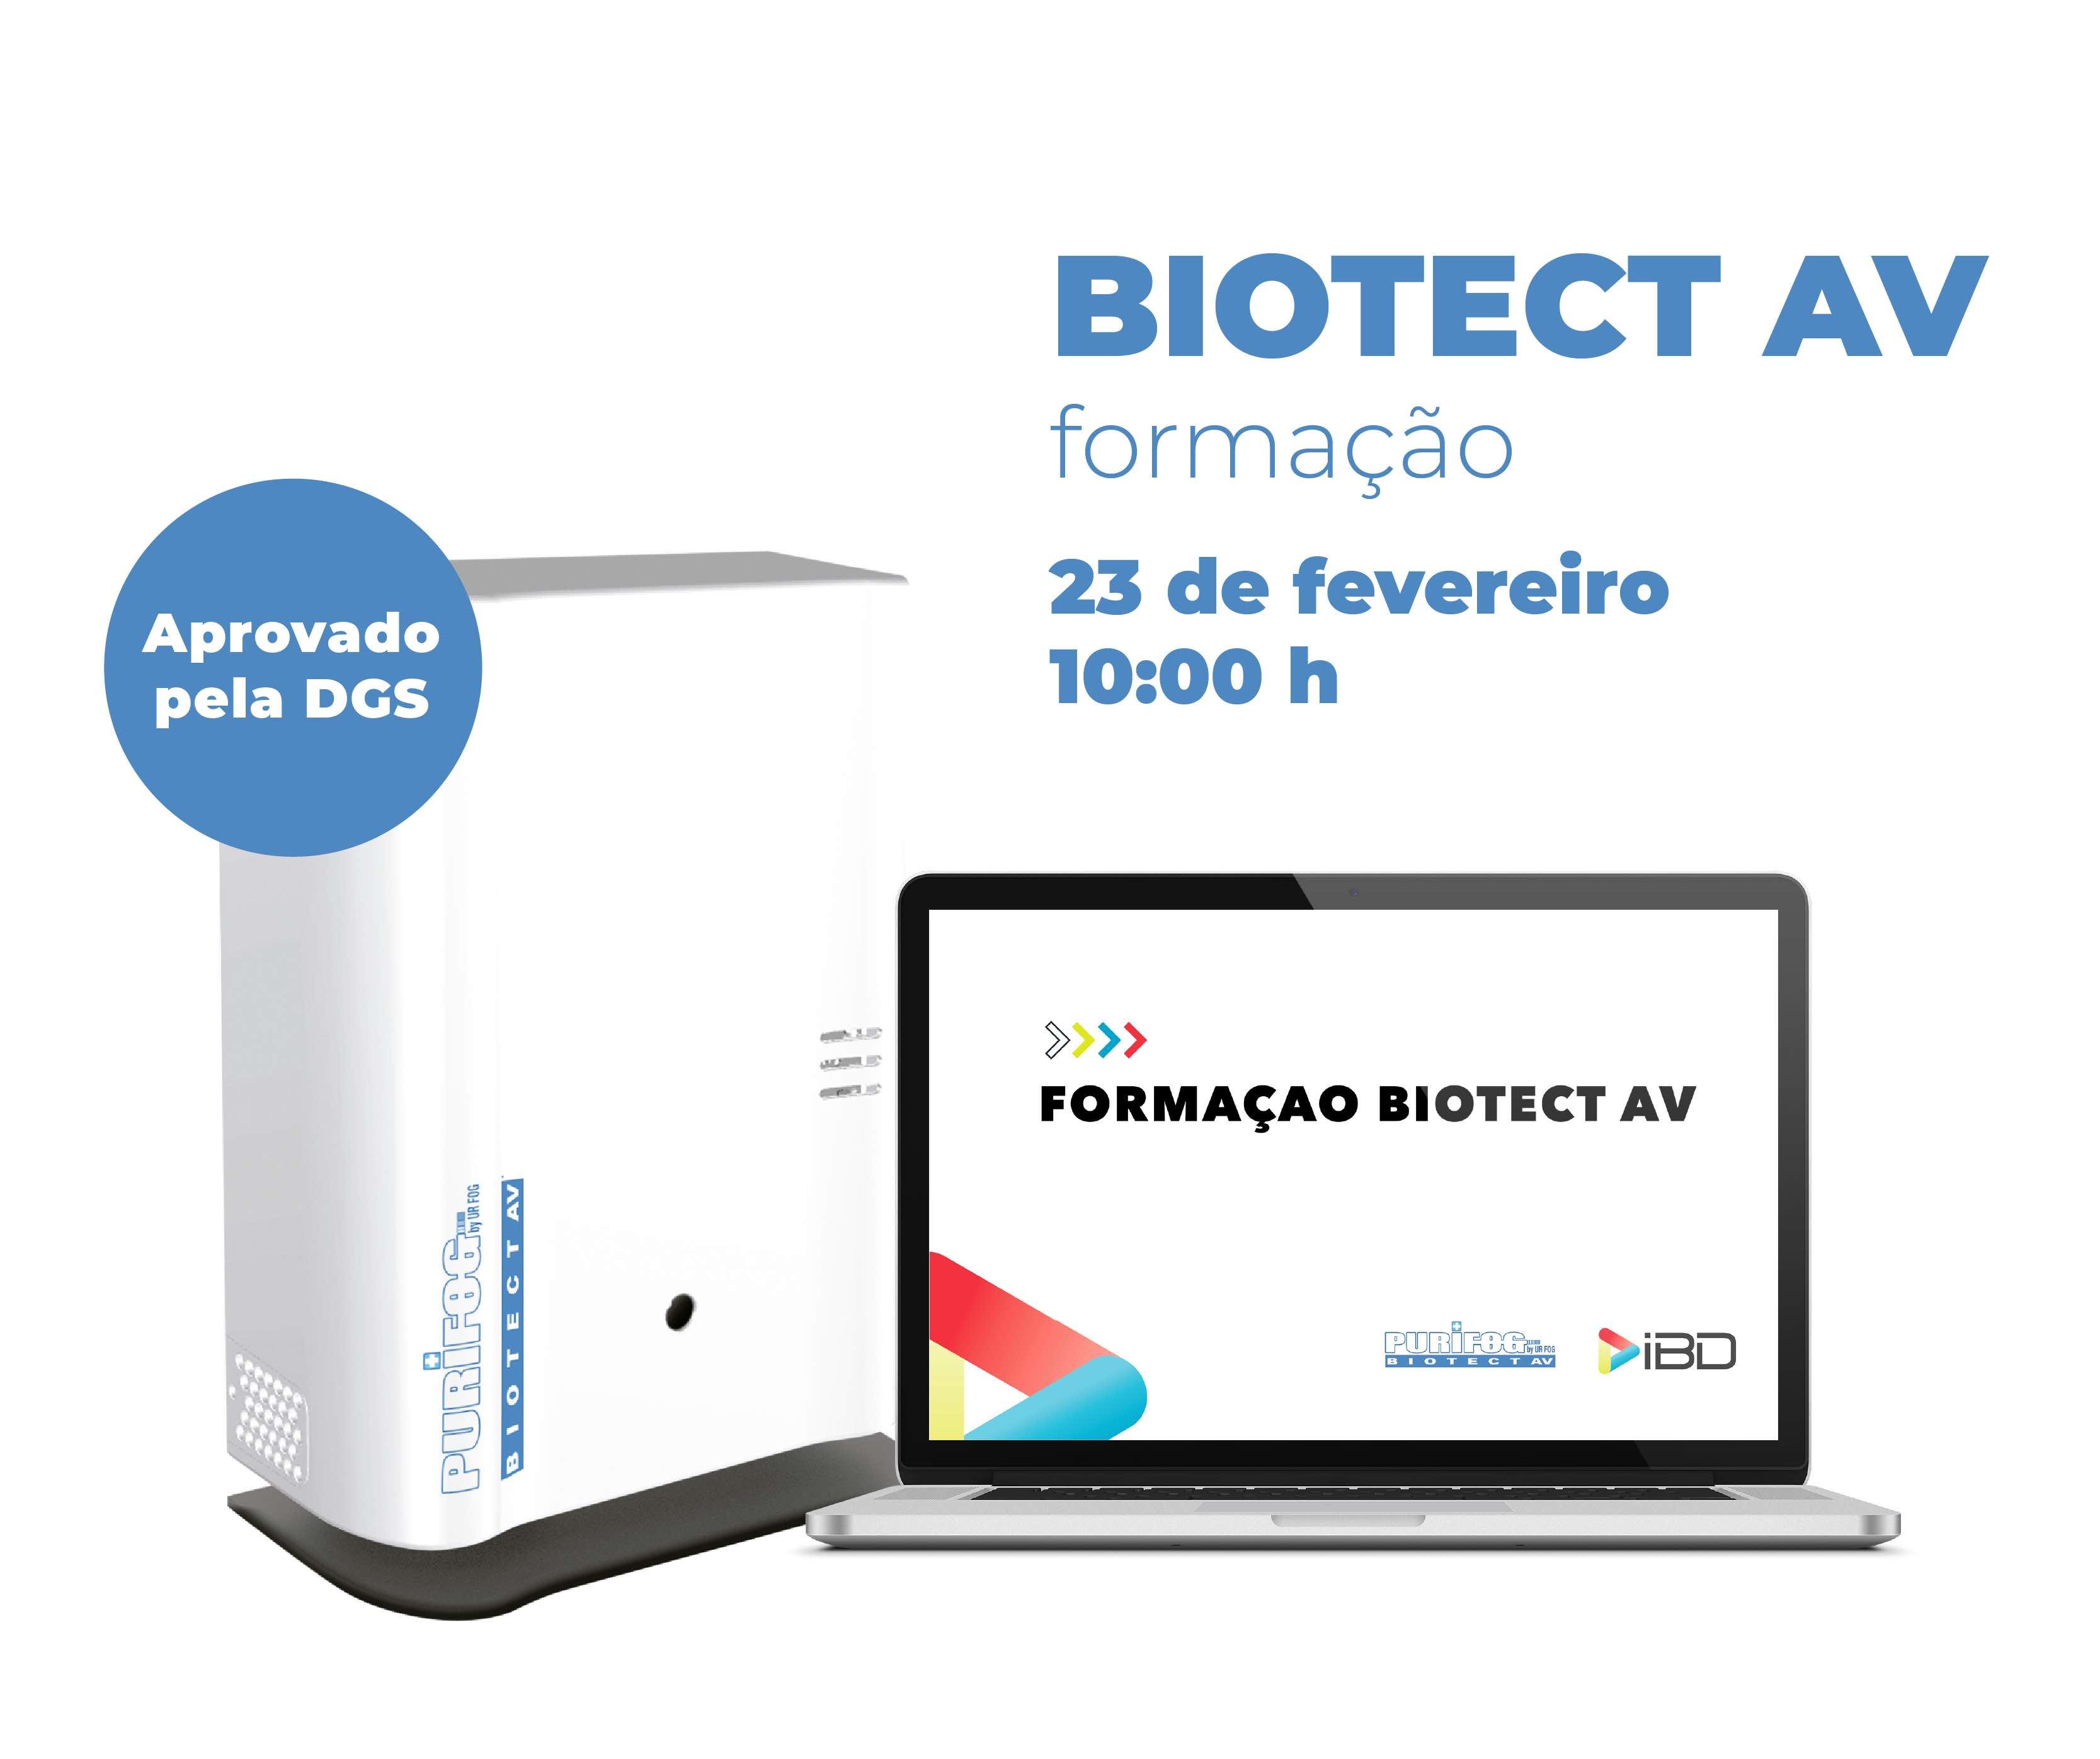 Formação BIOTECT AV